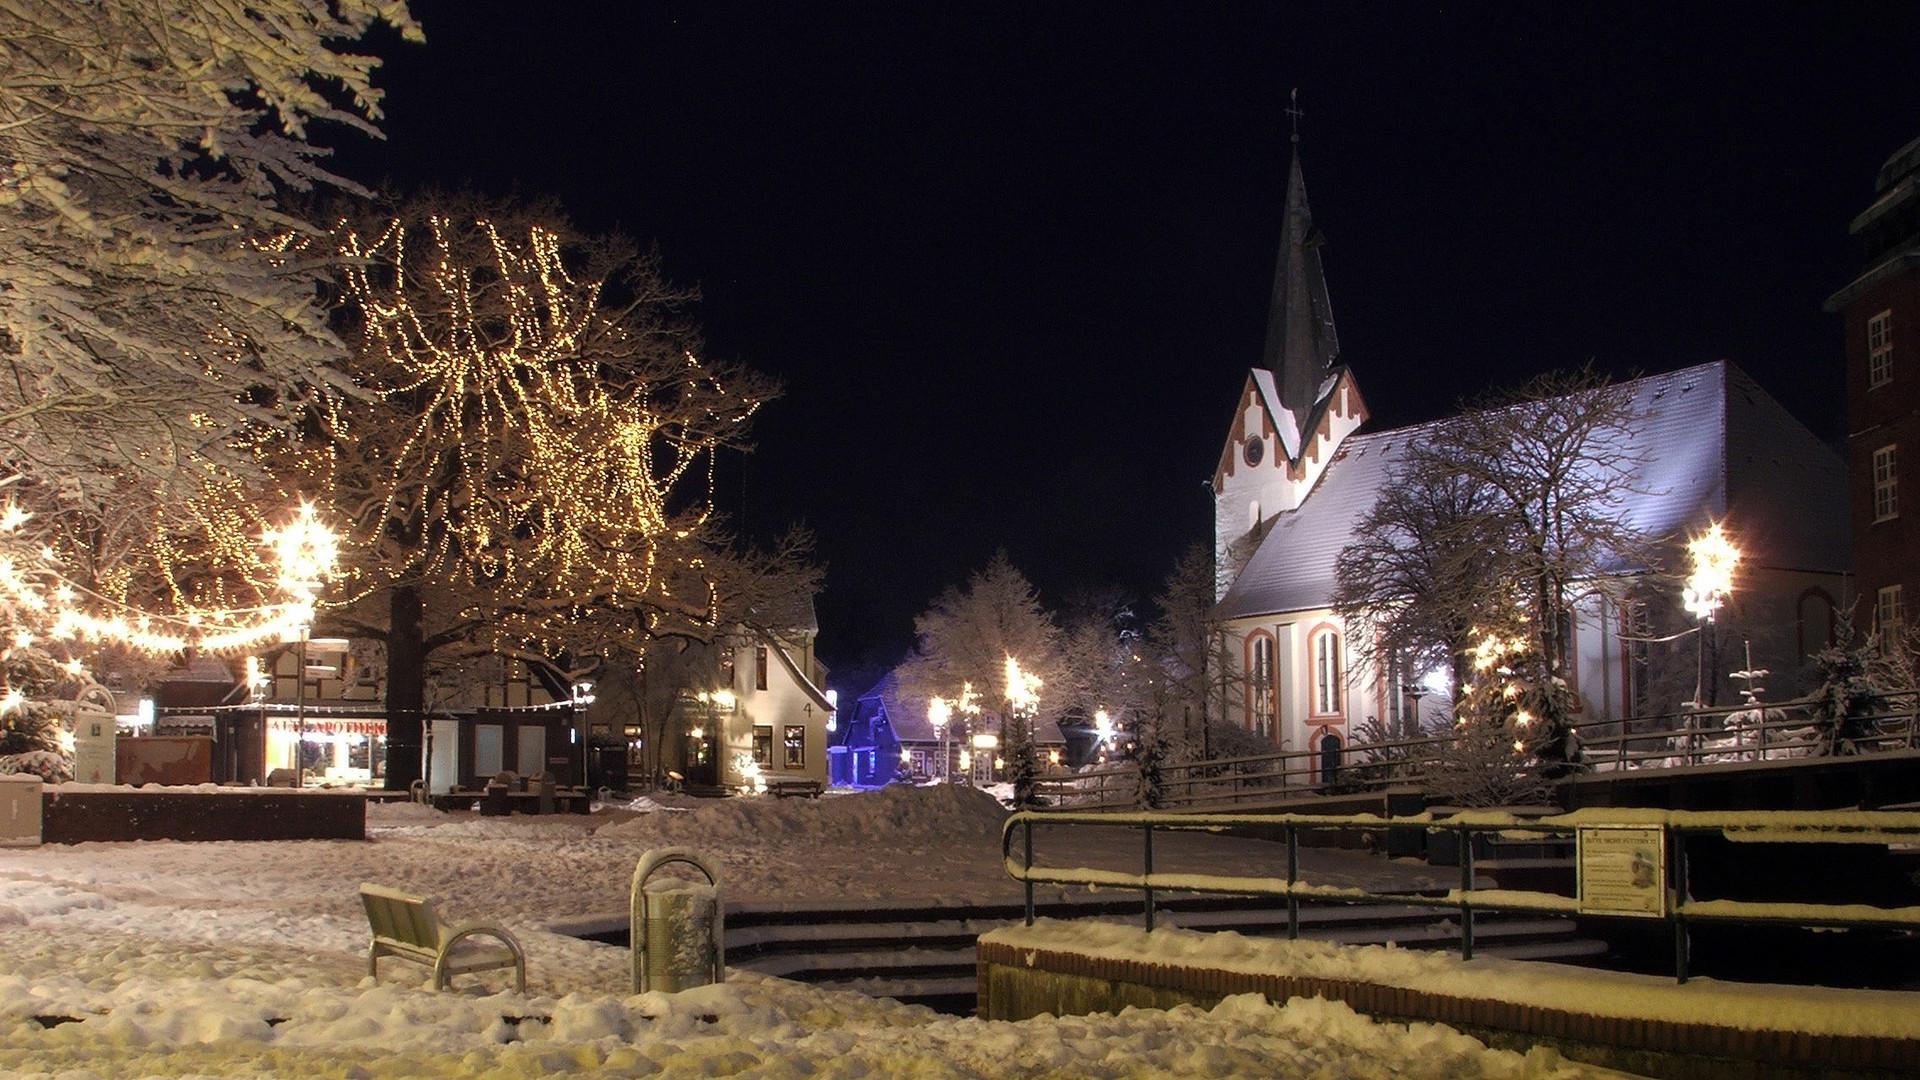 Osterholz im Schnee